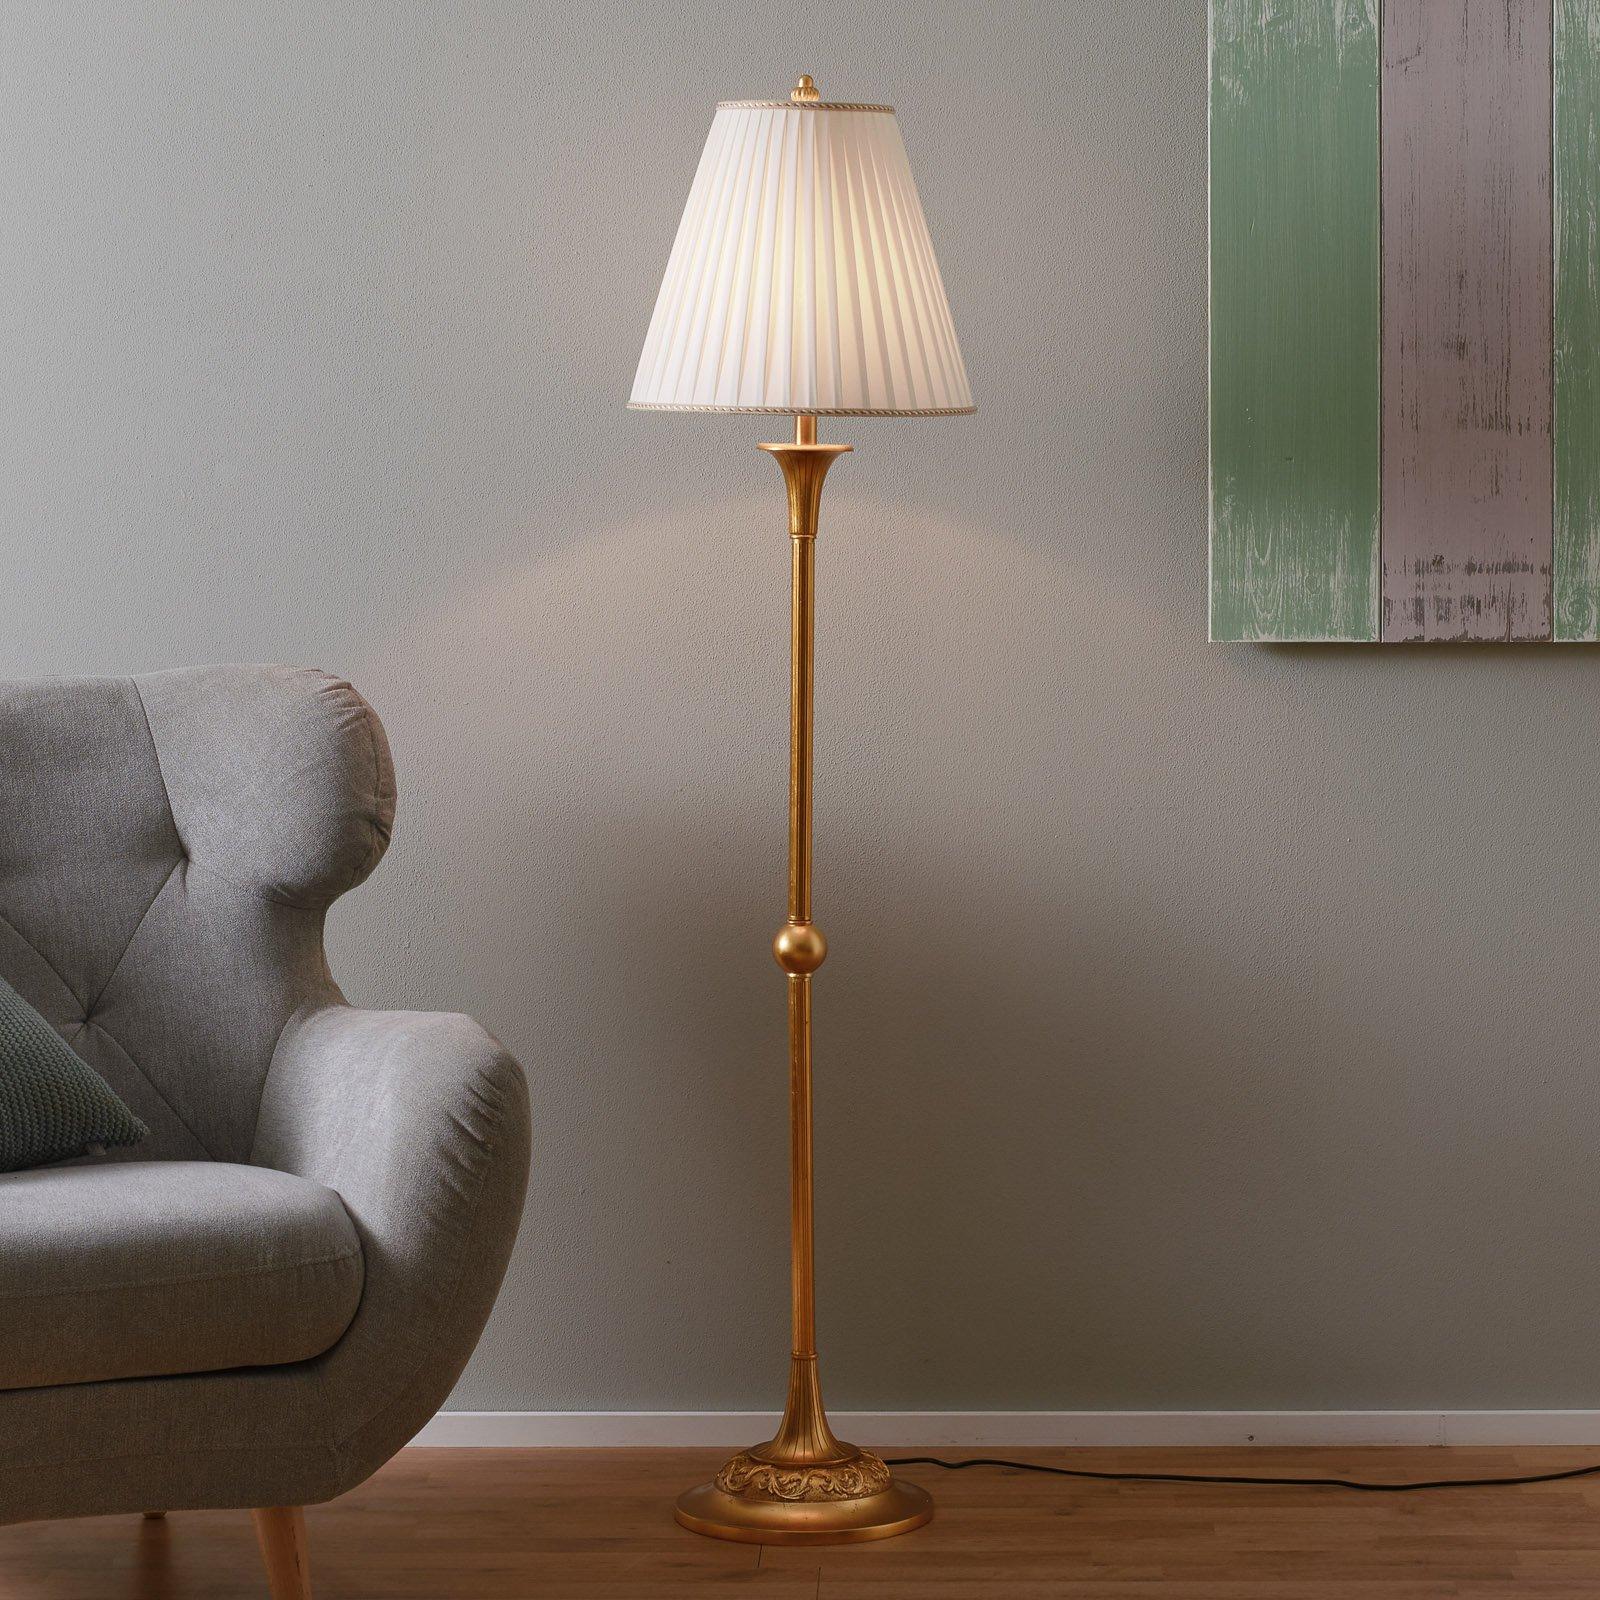 Stilig DONATA stålampe med plisséskjerm